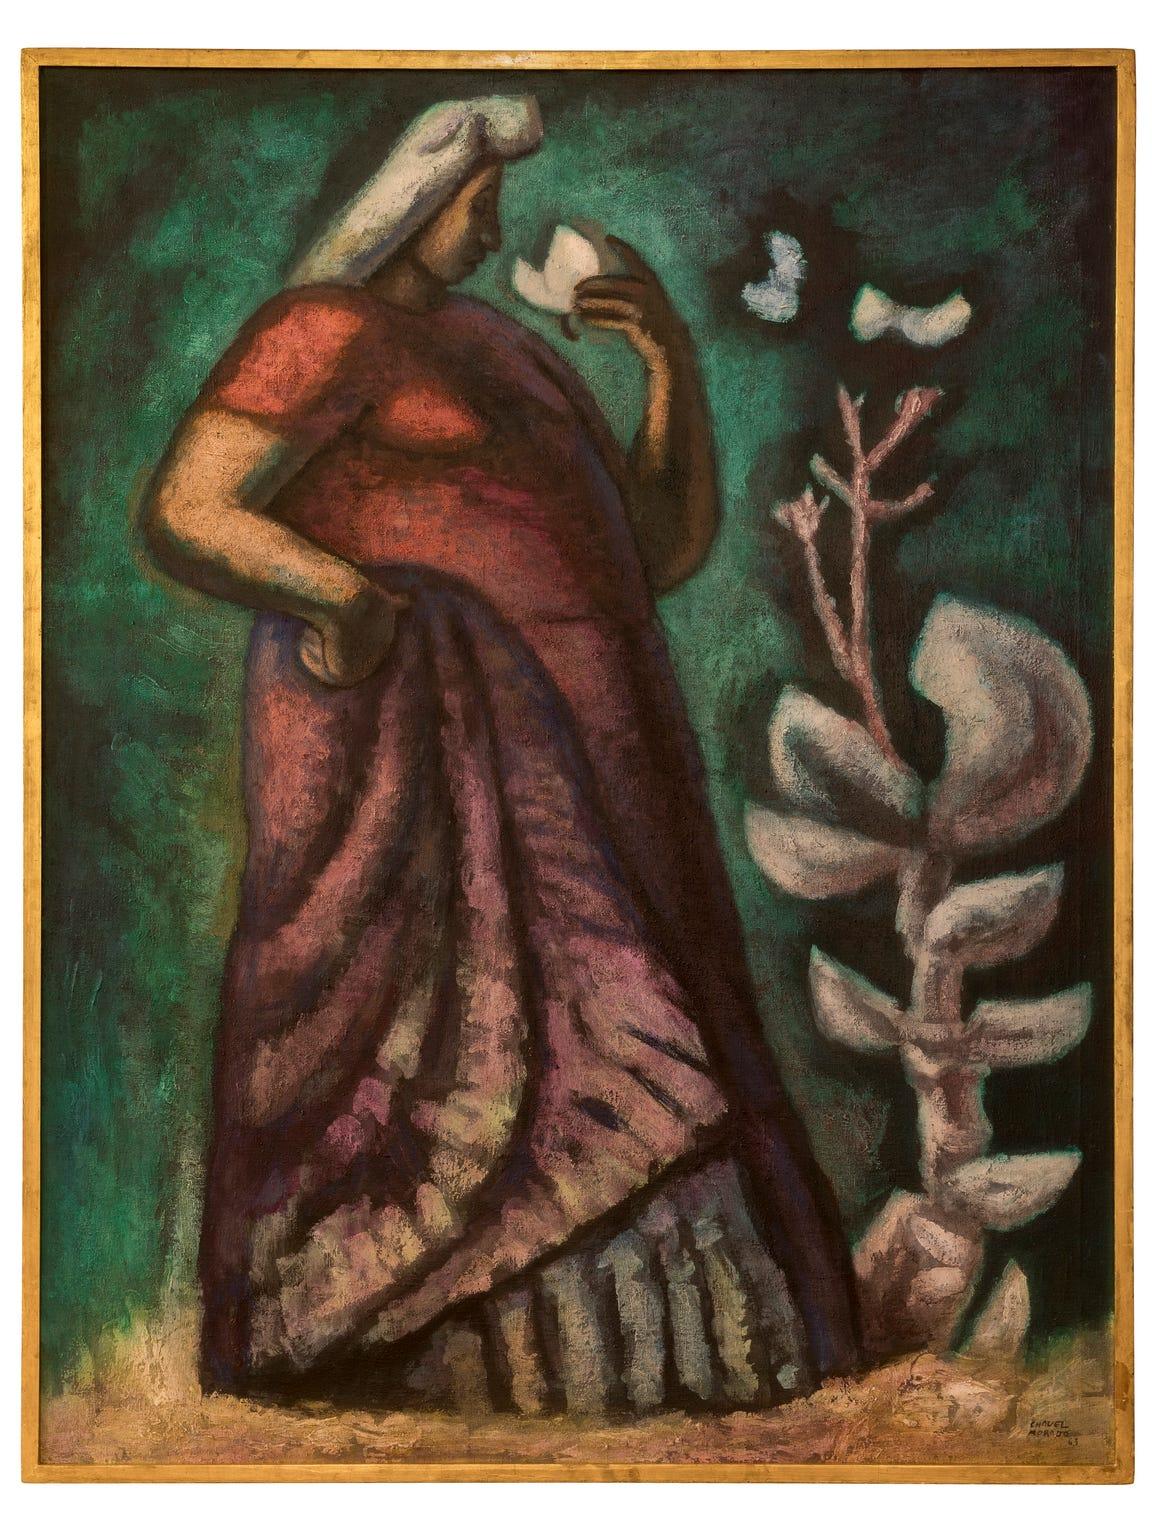 La Gran Tehuana (The Great Tehuana) 1963, by José Chávez